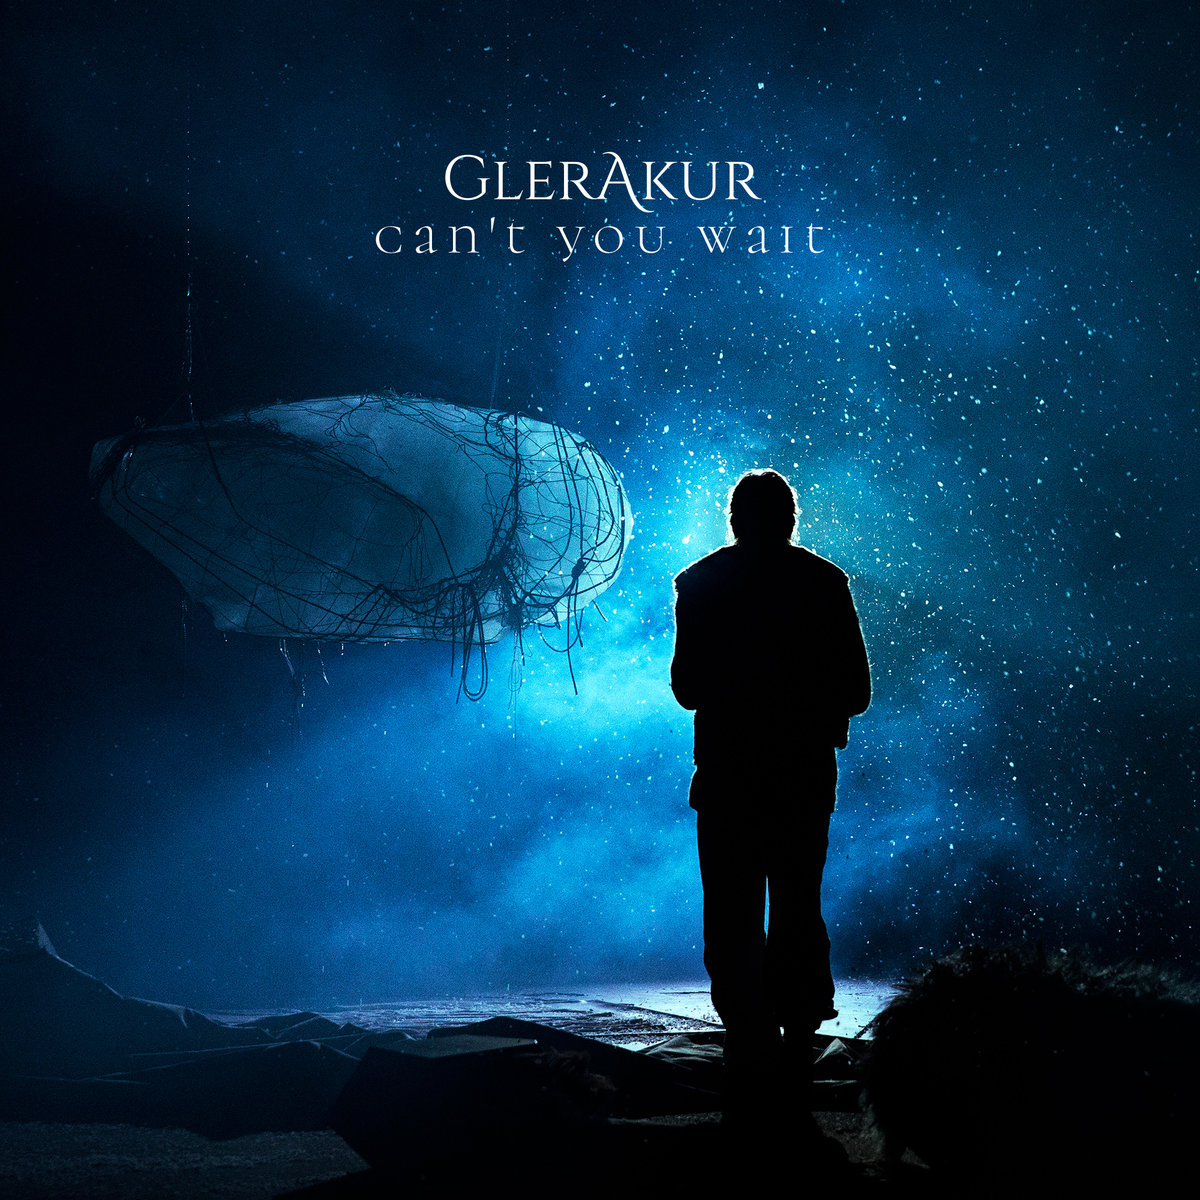 54. GlerAkur - Can't You Wait